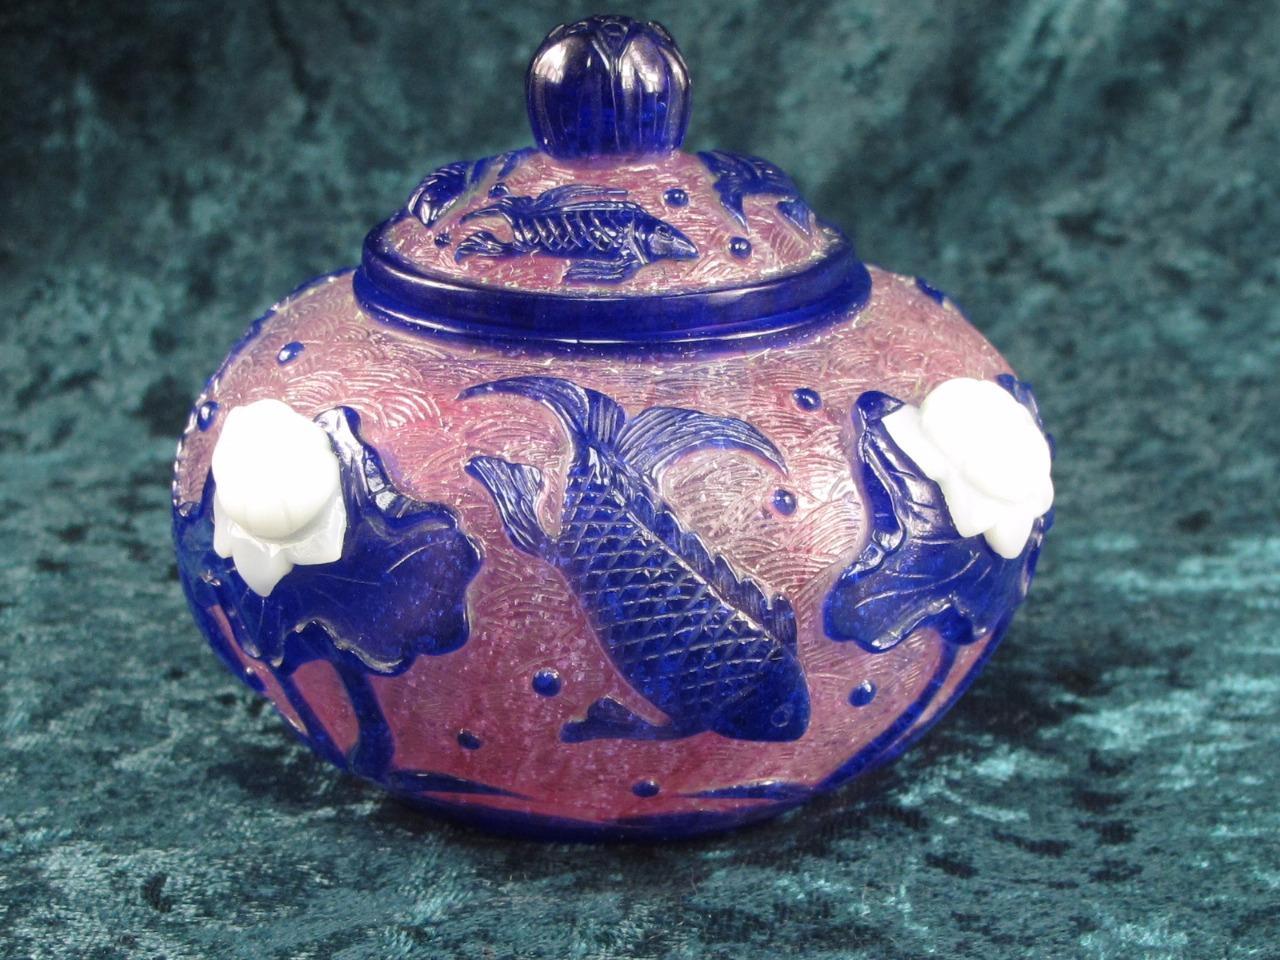 Vintage beautiful chinese peking glass jar blue overlay koi fish image is loading vintage beautiful chinese peking glass jar blue overlay izmirmasajfo